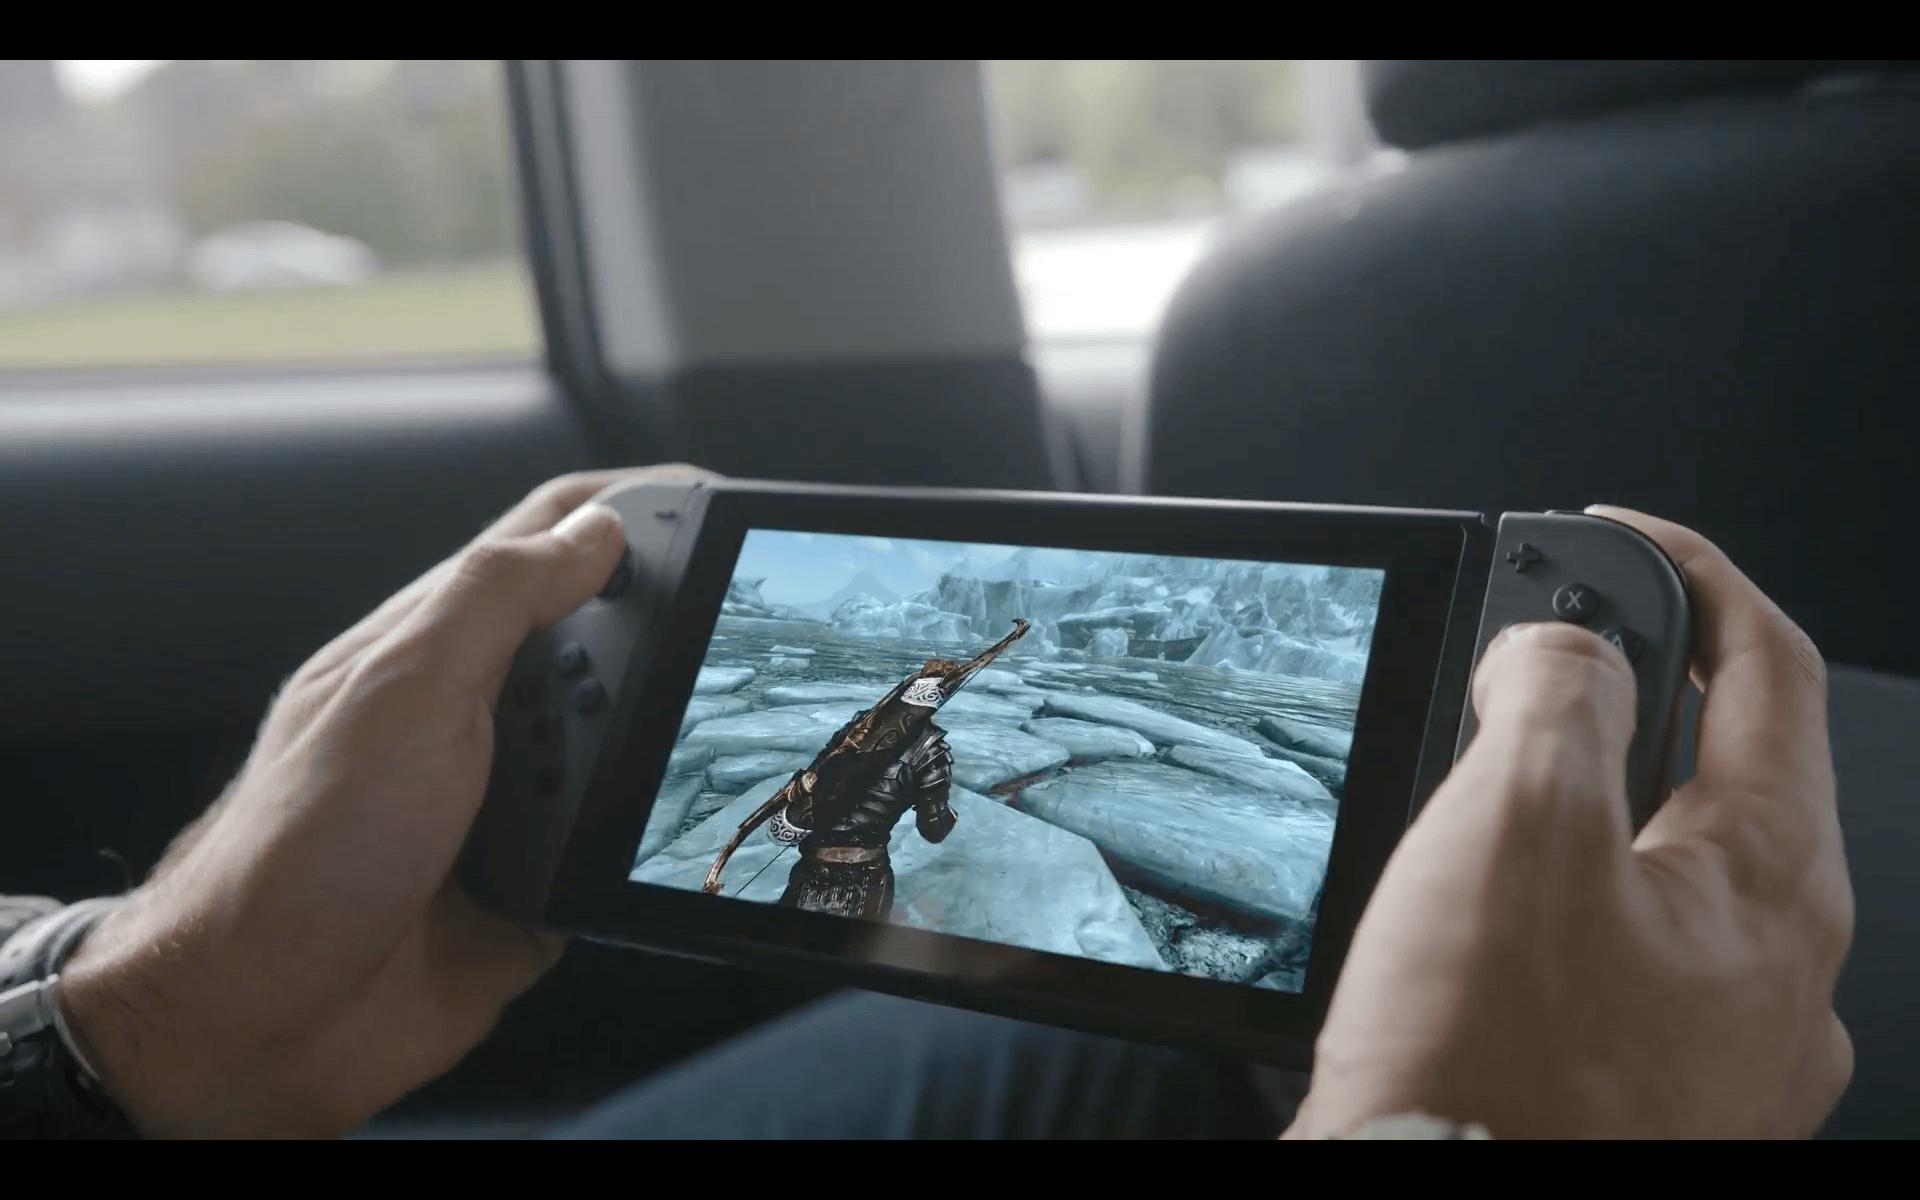 nvidia promet que la nintendo switch fera tourner des jeux sortis sur ps4 facilement frandroid. Black Bedroom Furniture Sets. Home Design Ideas